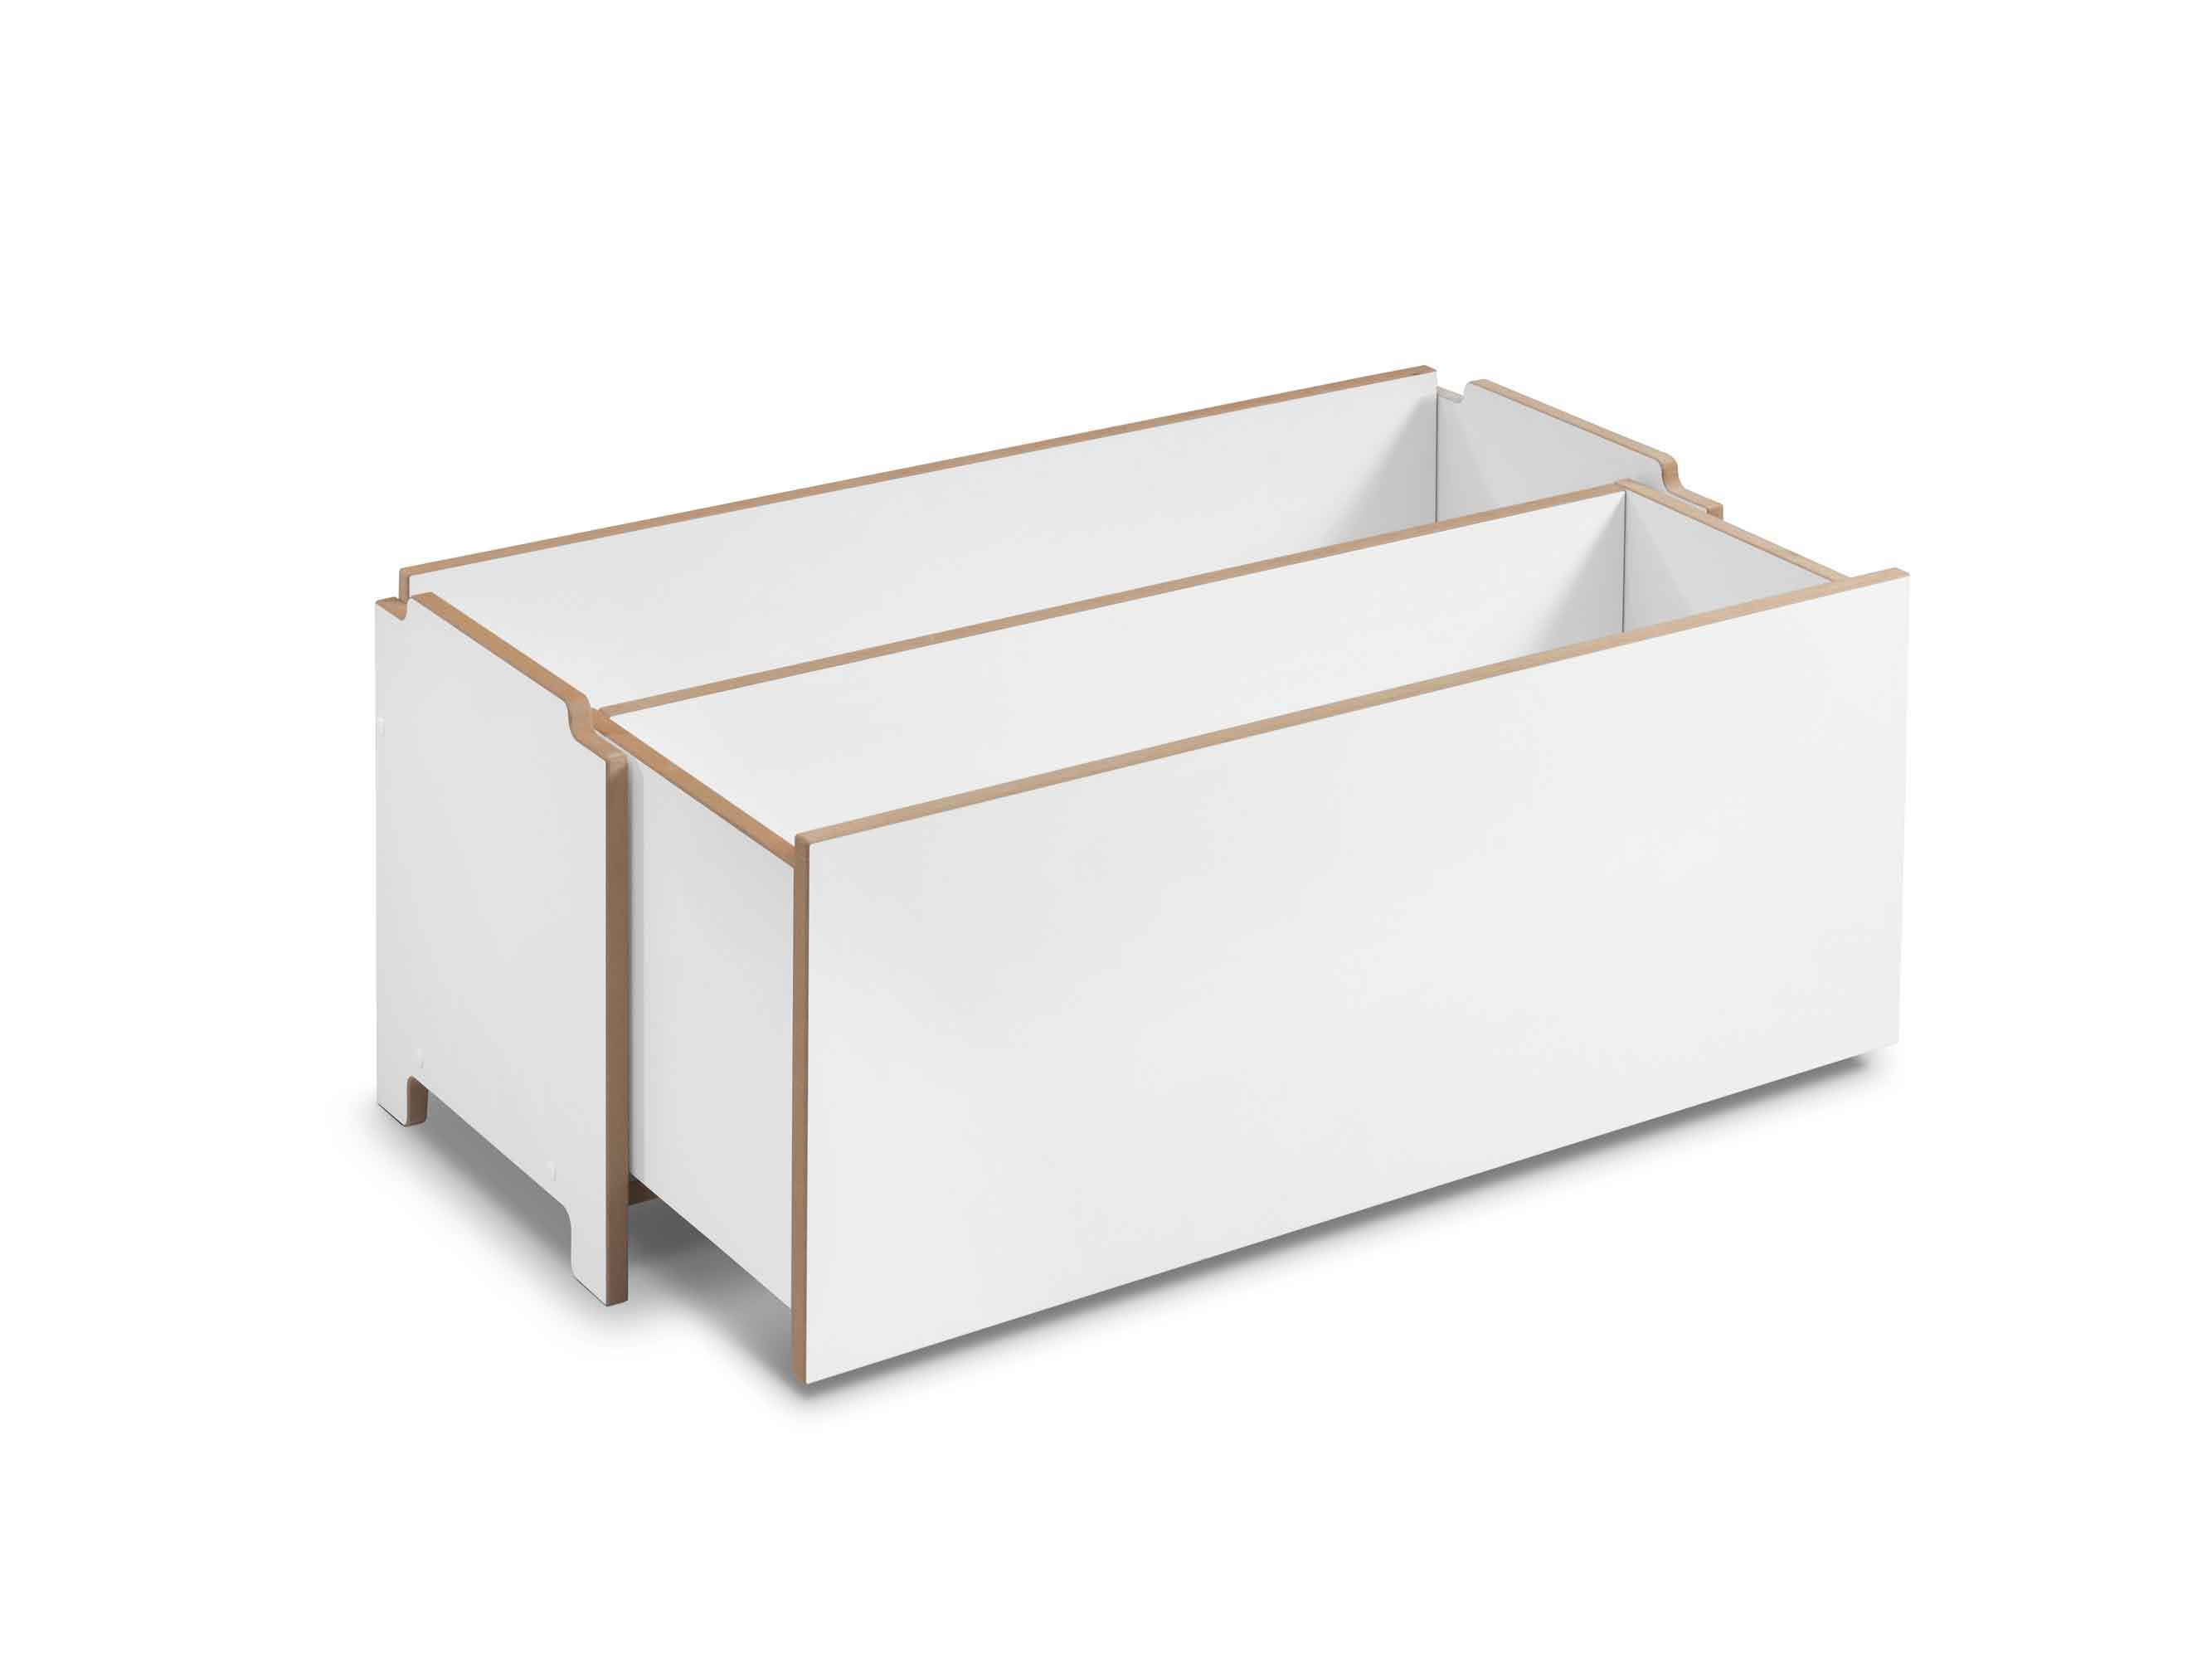 harry regal mit 1 schublade 33 5 cm tief country living shop. Black Bedroom Furniture Sets. Home Design Ideas